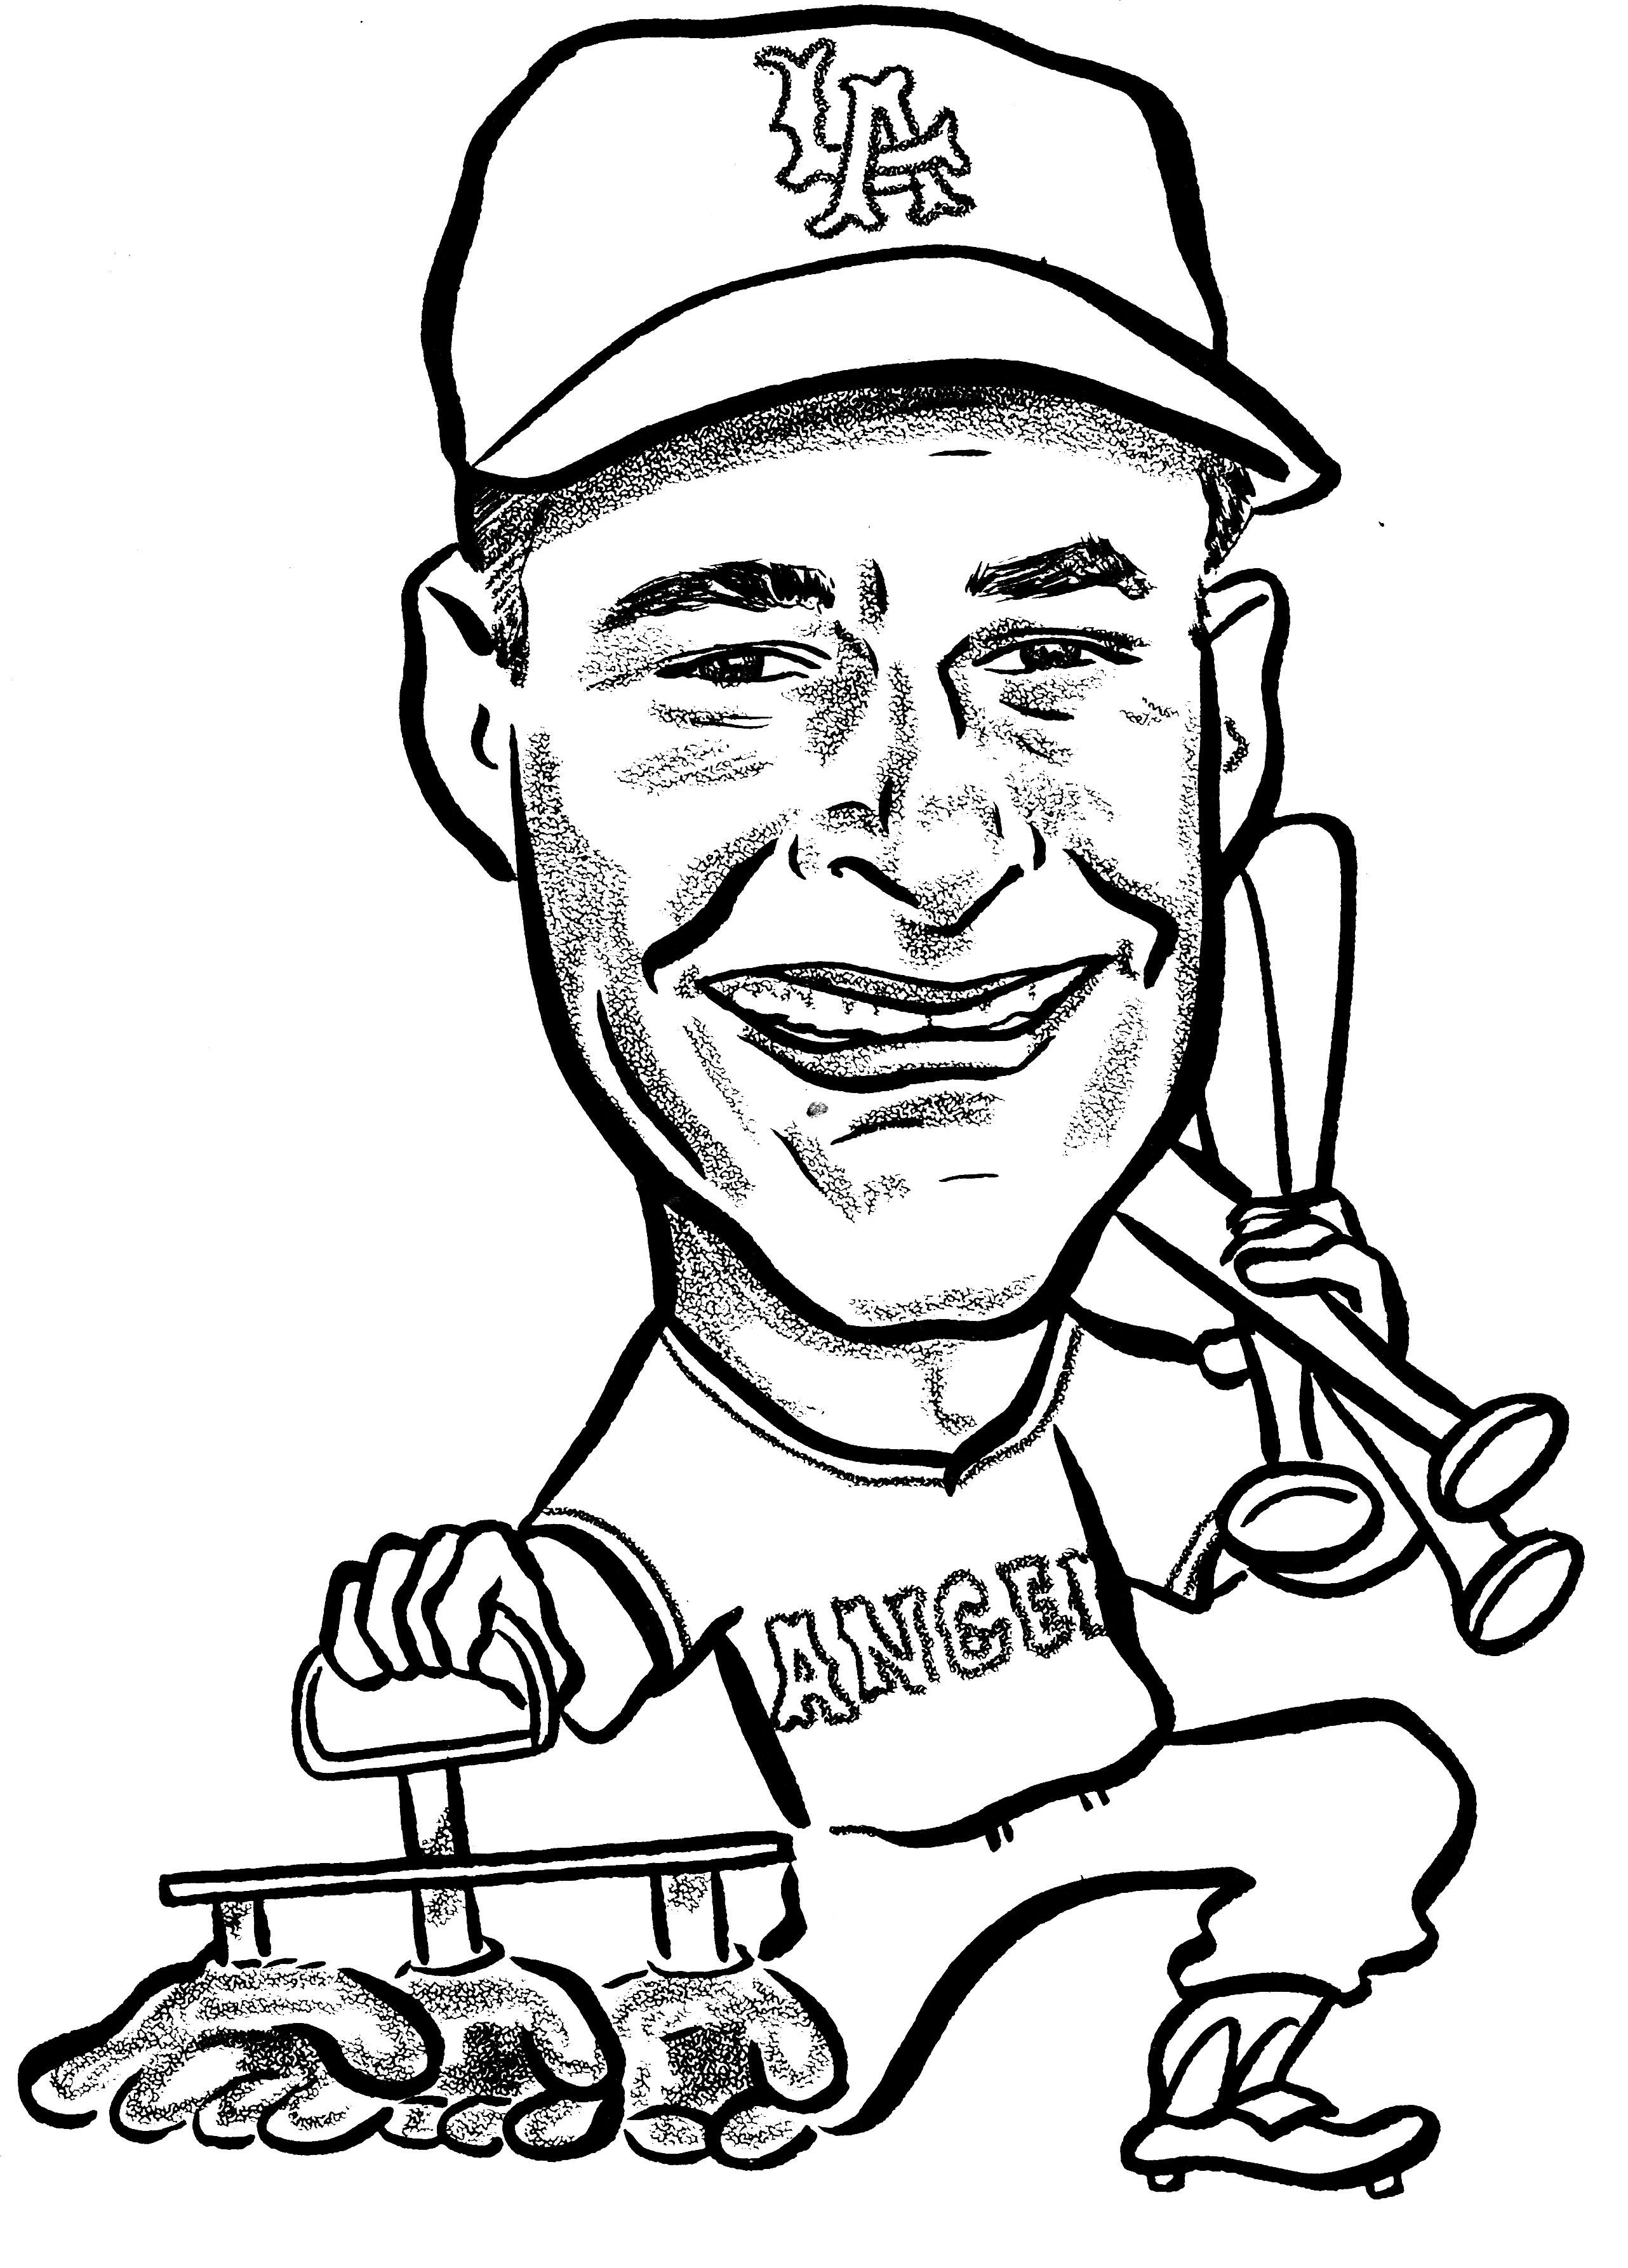 bob sadowski third baseman wikipedia